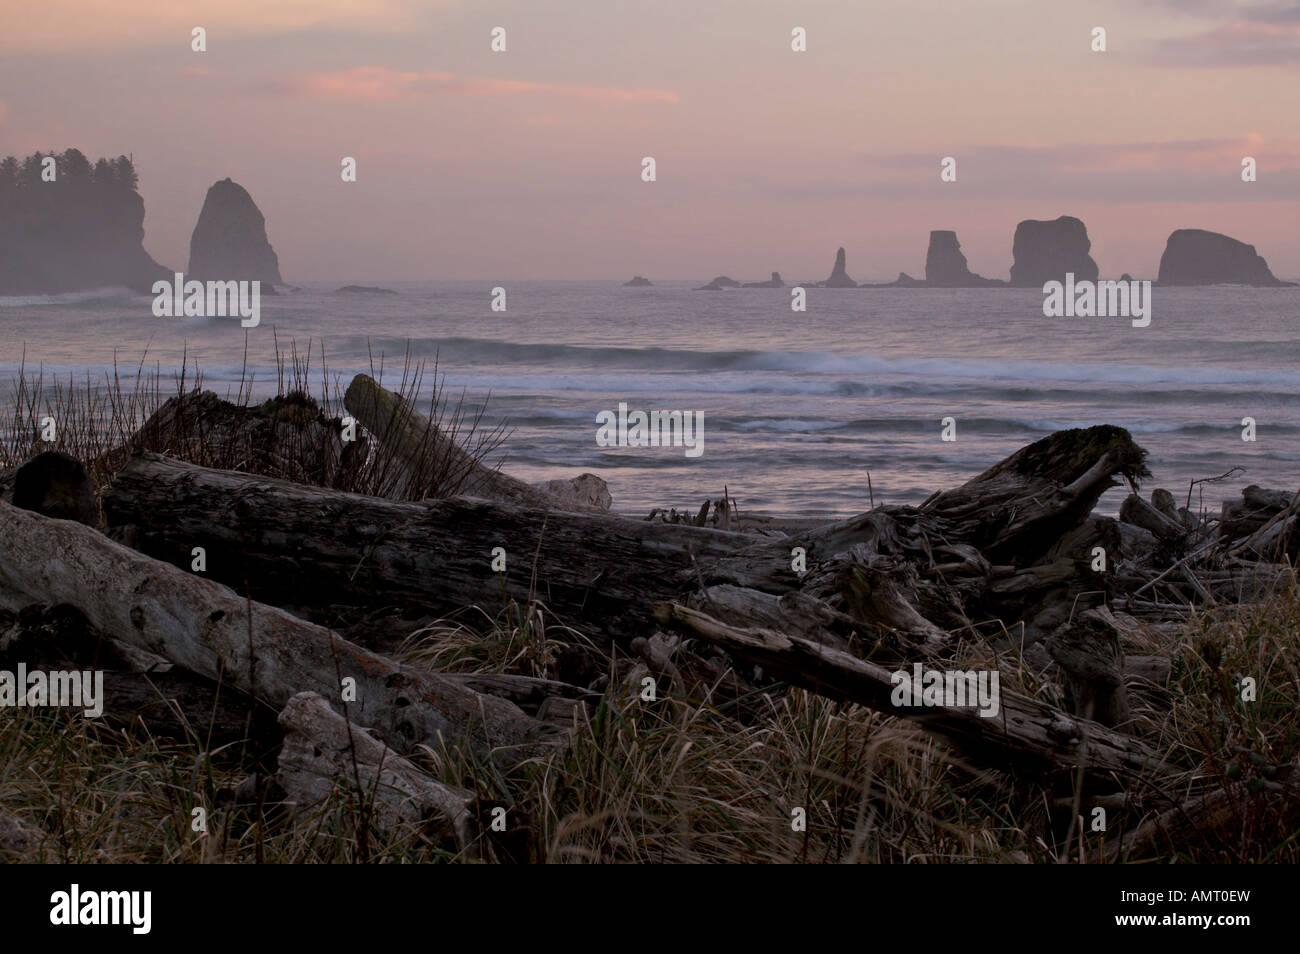 Olympic National Park, La Push, first Beach, Olympic Peninsula, Washington, USA, North America. - Stock Image